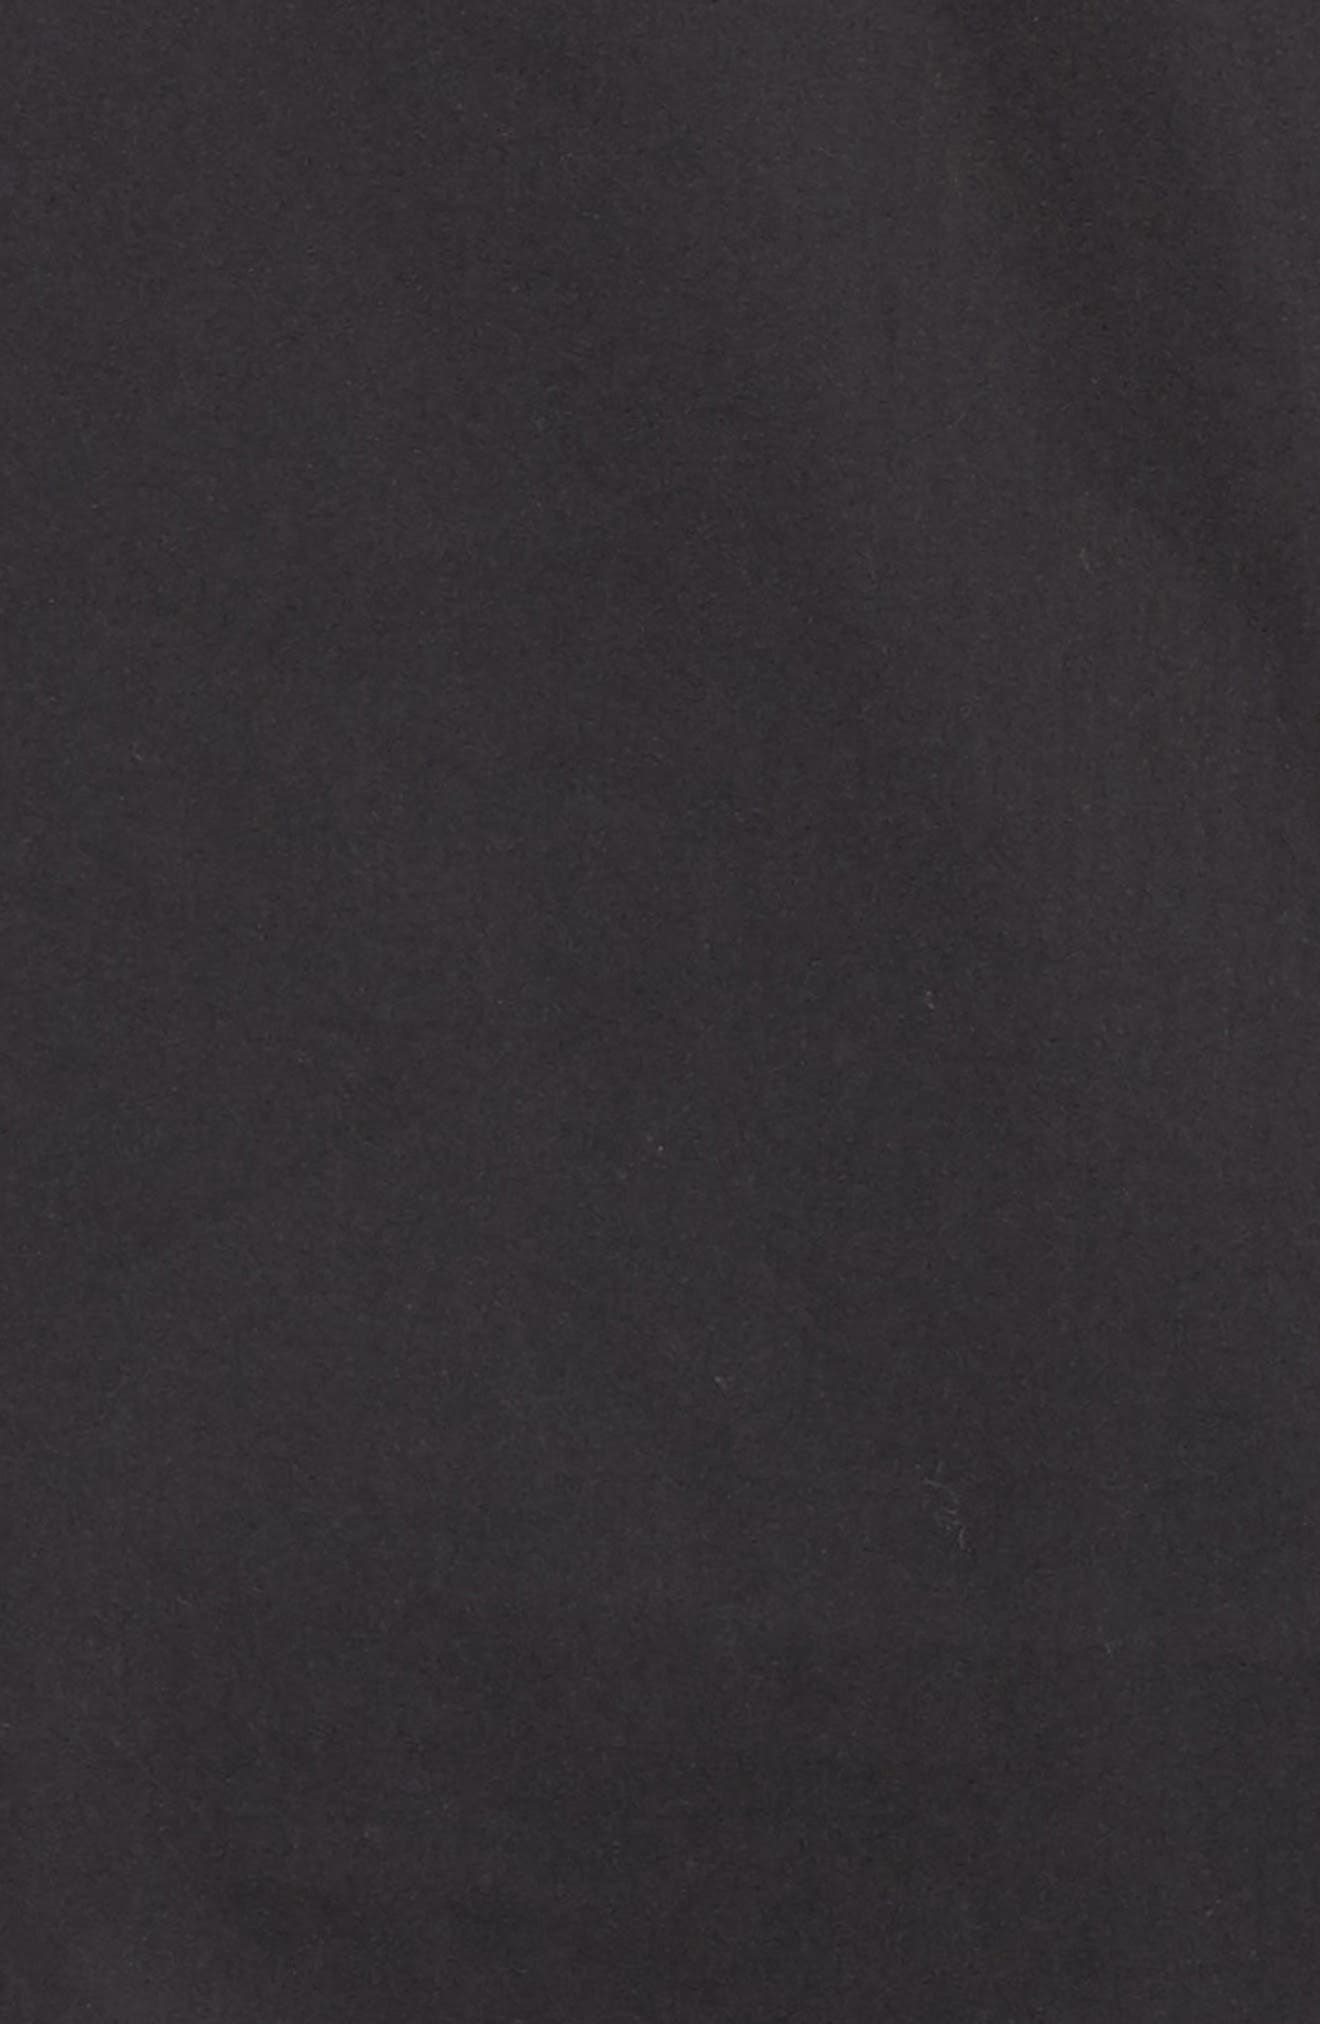 Bell Sleeve Poplin Top,                             Alternate thumbnail 5, color,                             001